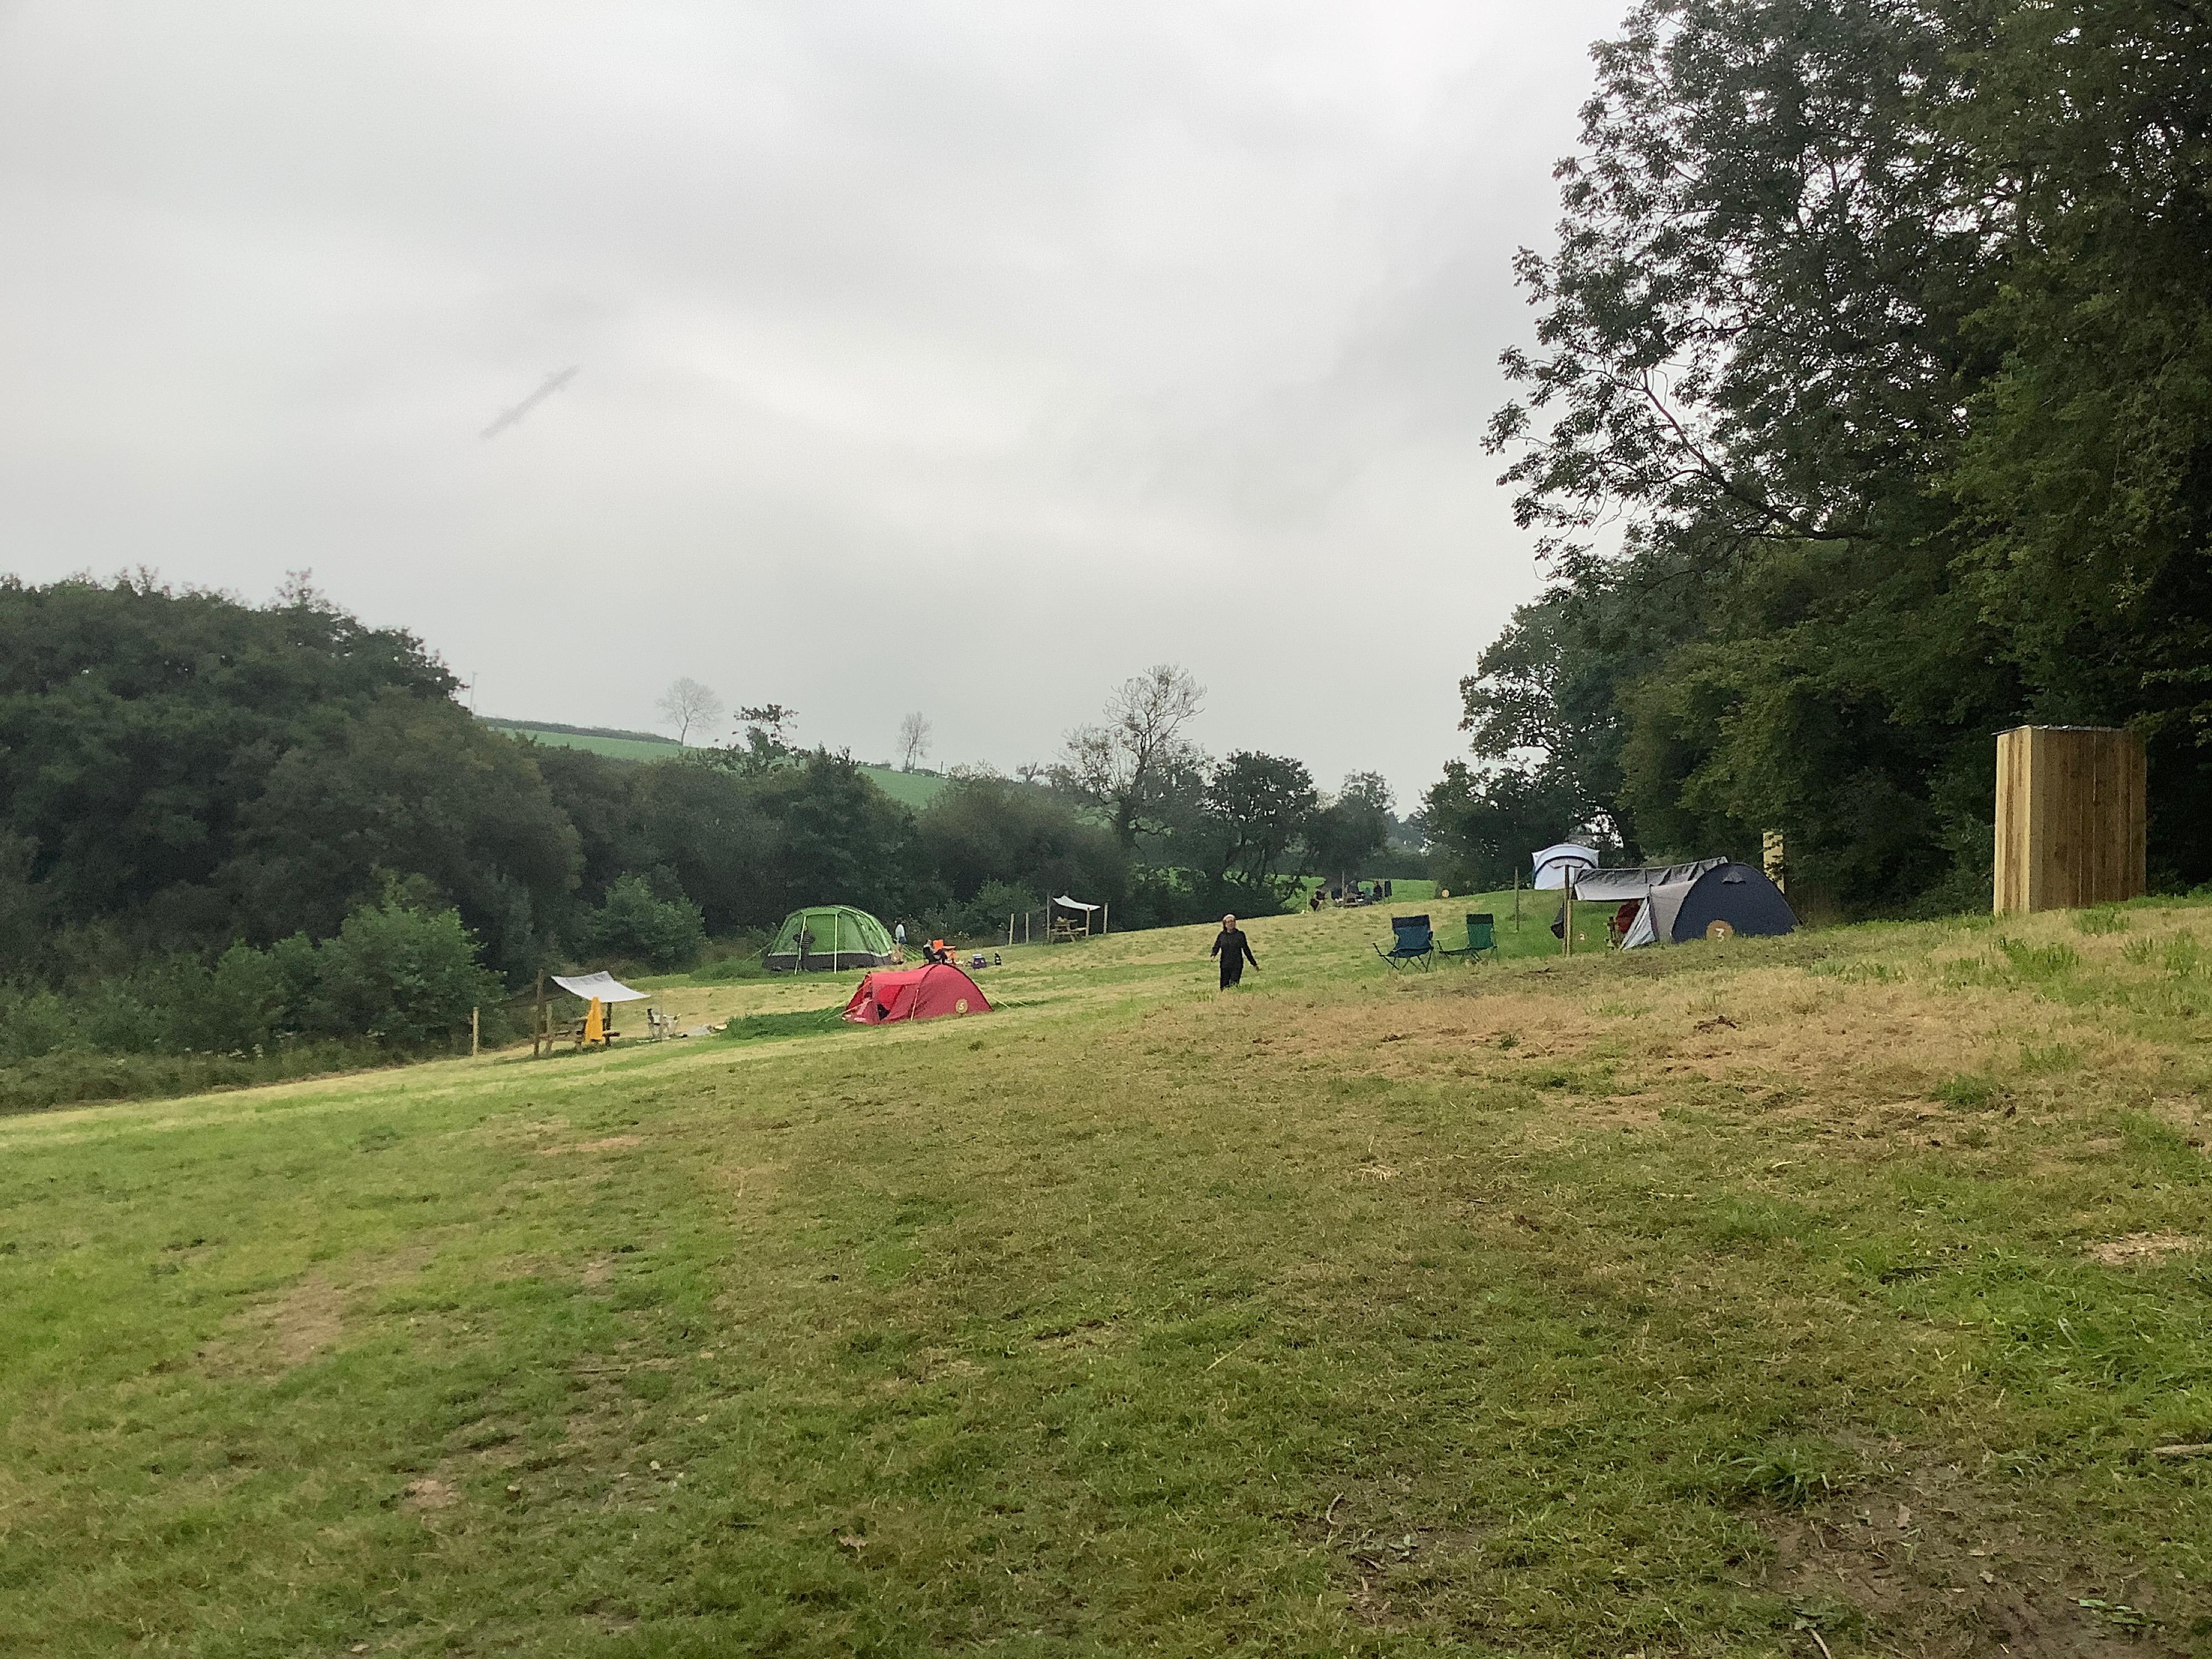 camping field 2